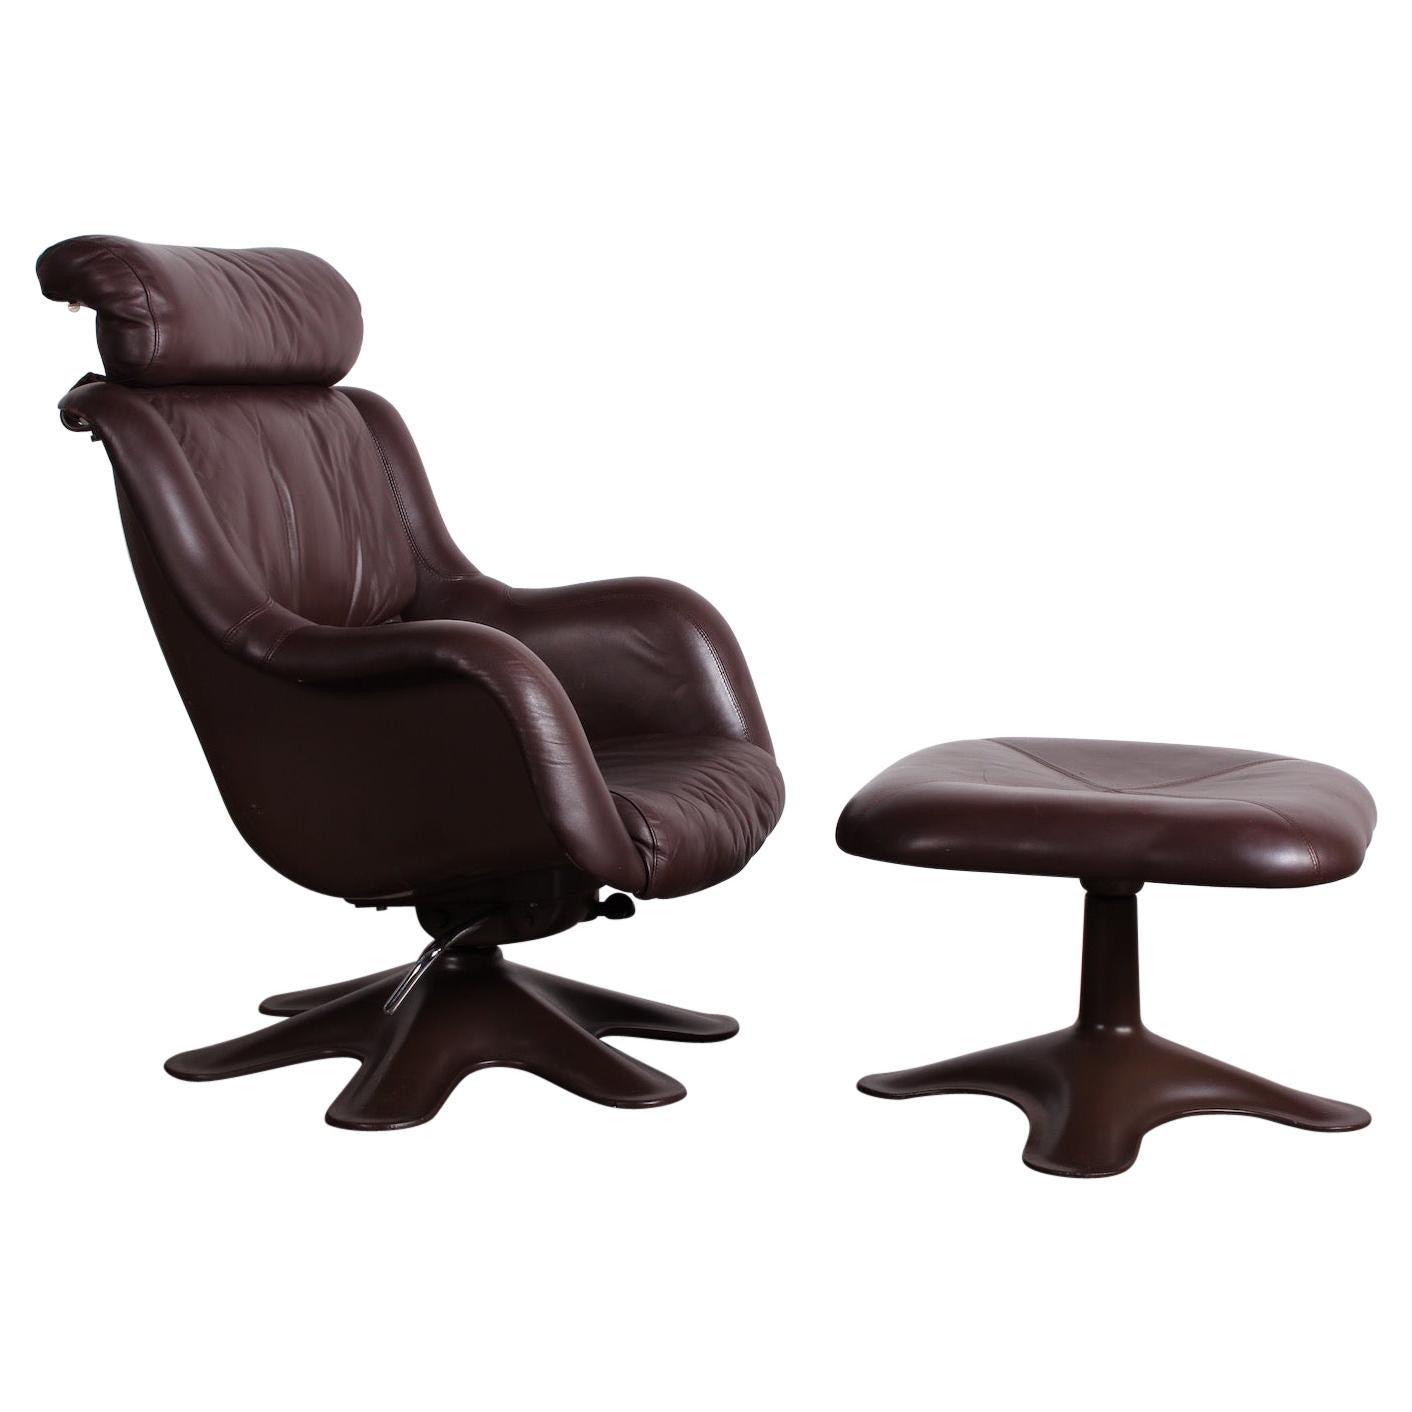 "Yrjo Kukkapuro ""Karuselli"" Lounge Chair and Ottoman"